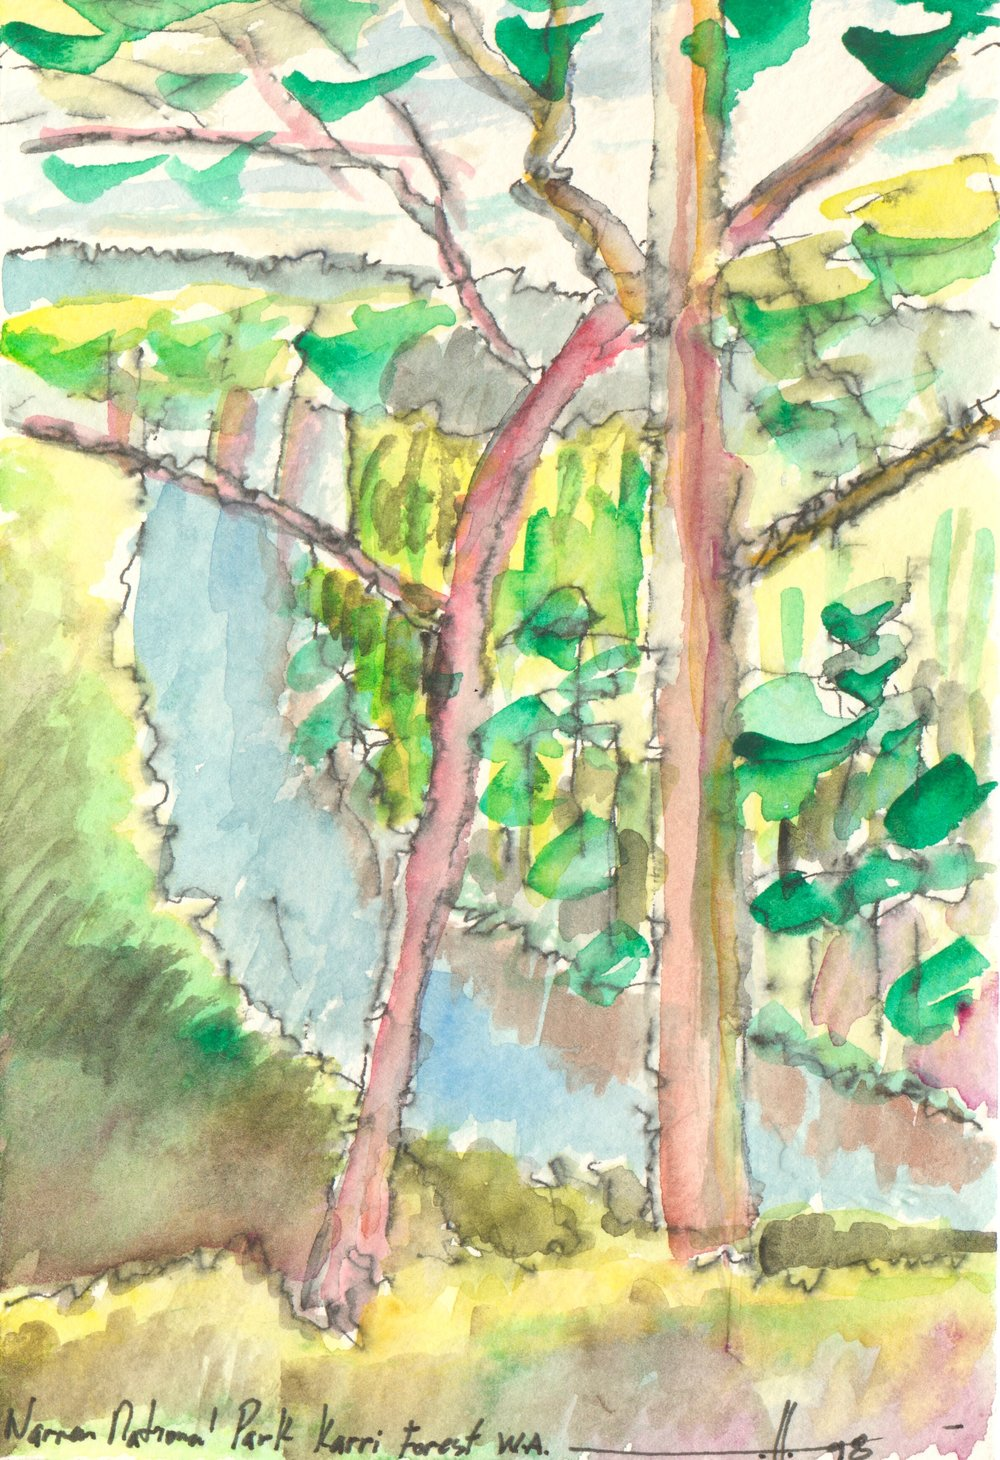 Warren National Karri Forest, W.A. 98-181211-0012.jpg